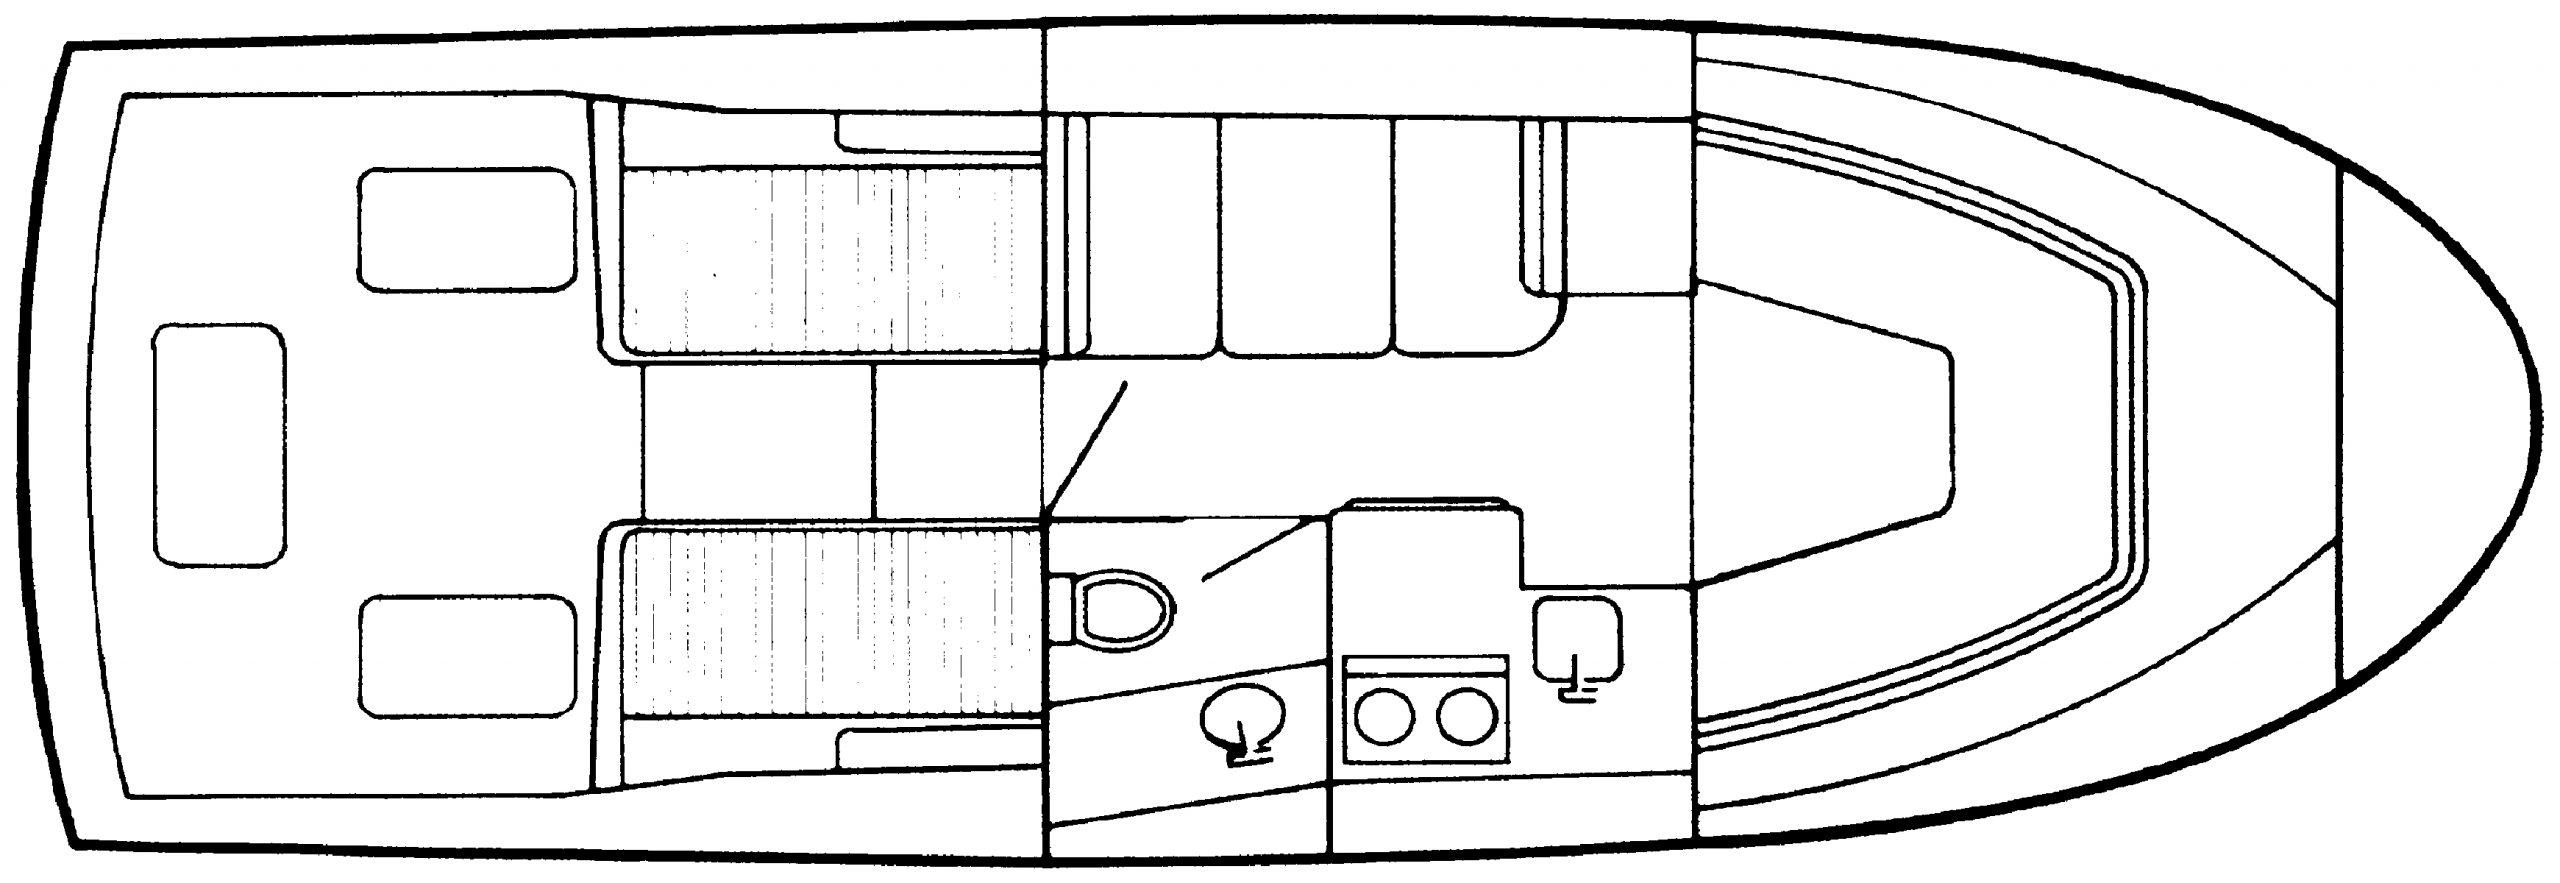 29 Flybridge Floor Plan 2